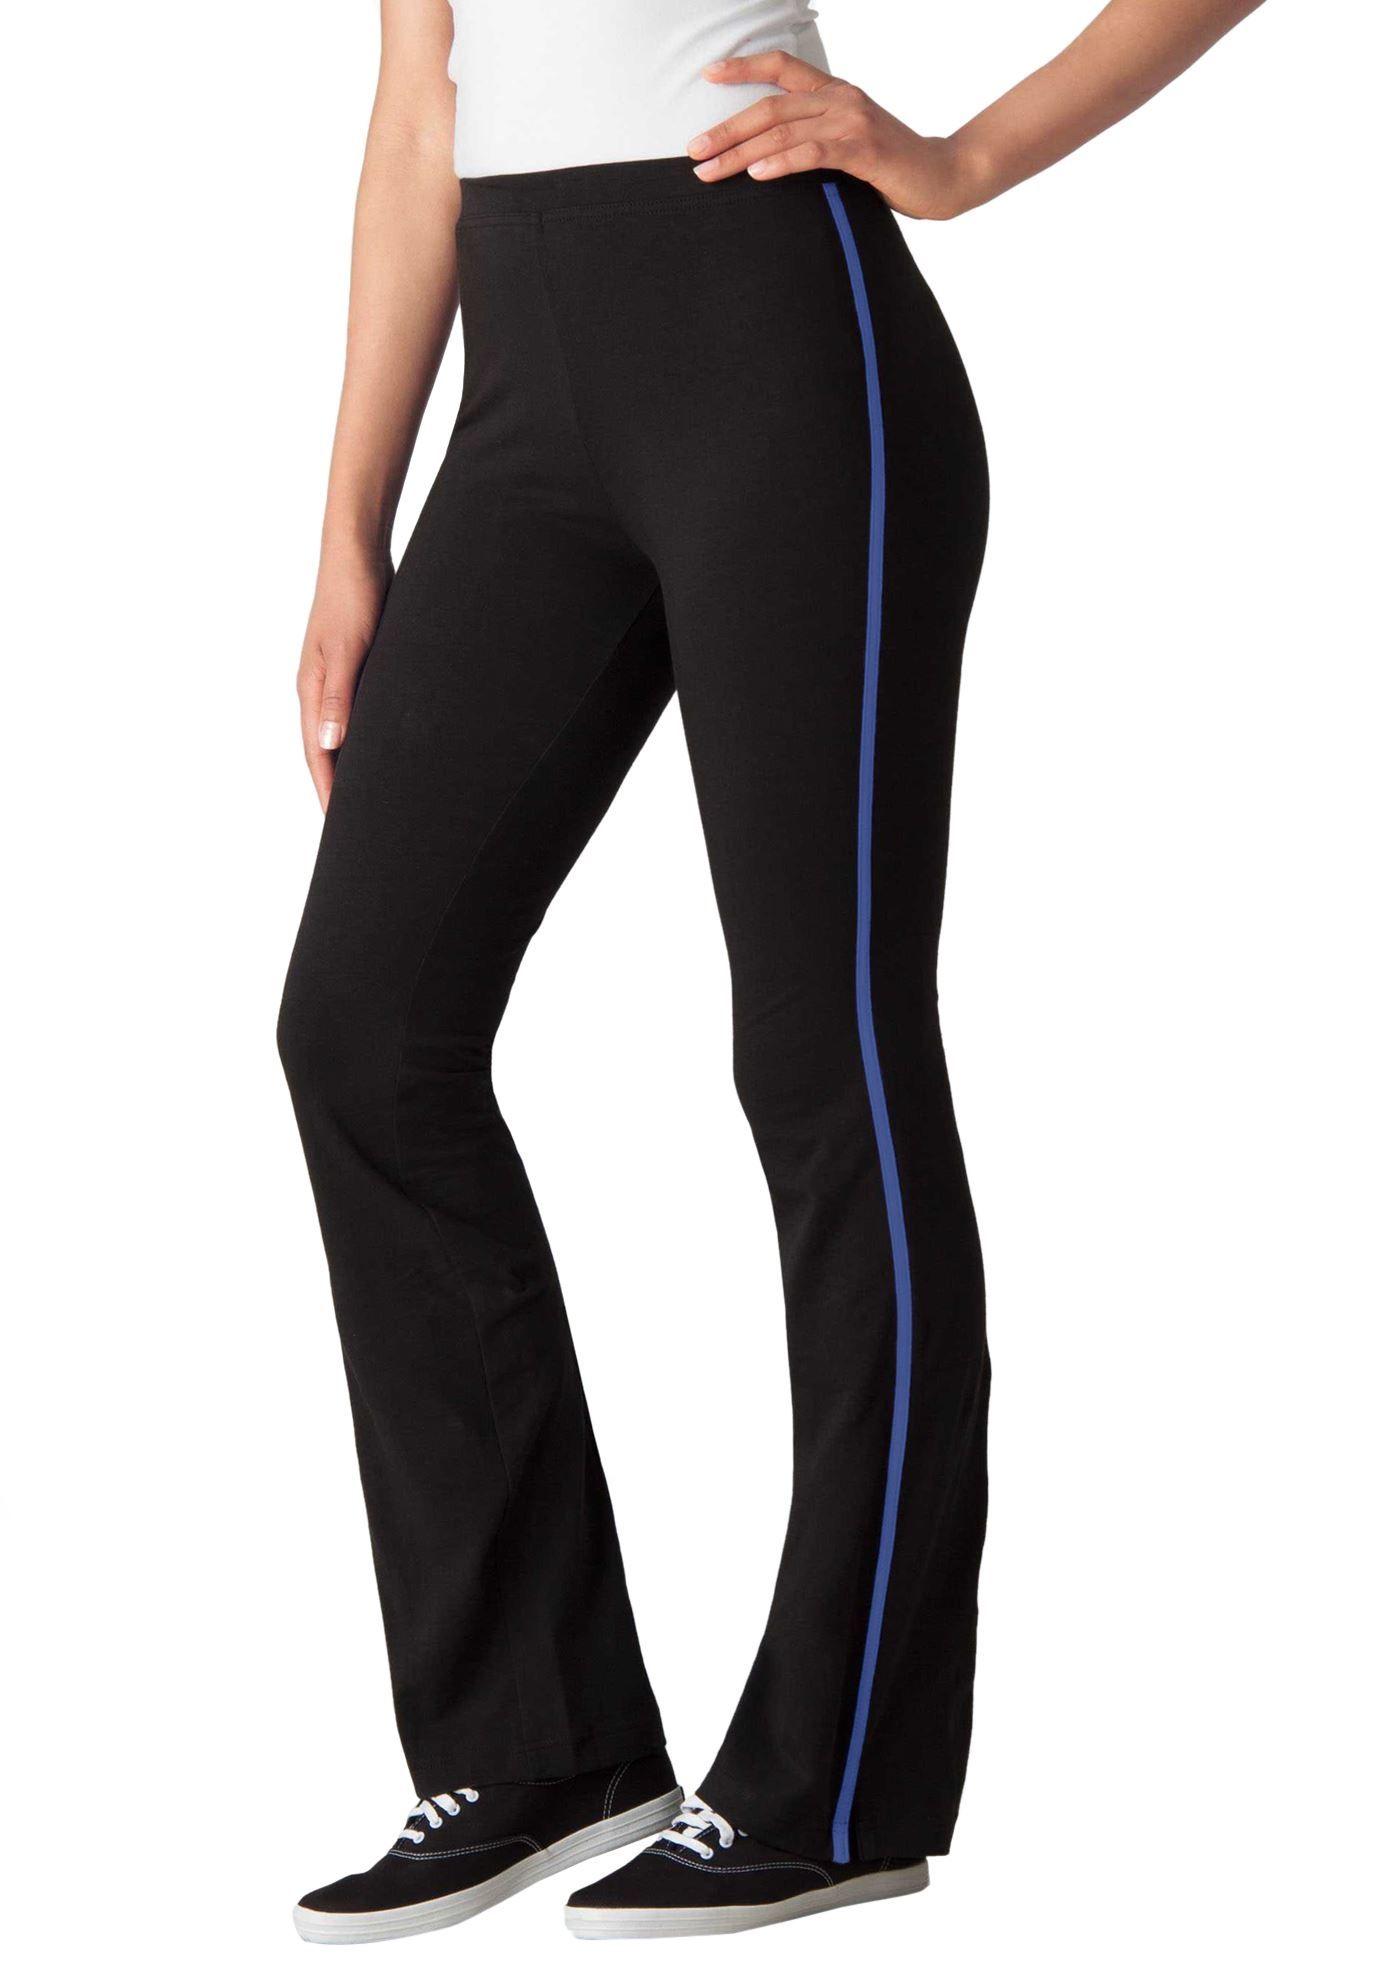 24b95a1502dad Petite Stretch Bootcut Yoga Pants With Side Stripes Plus Size Petite Yoga  Pants